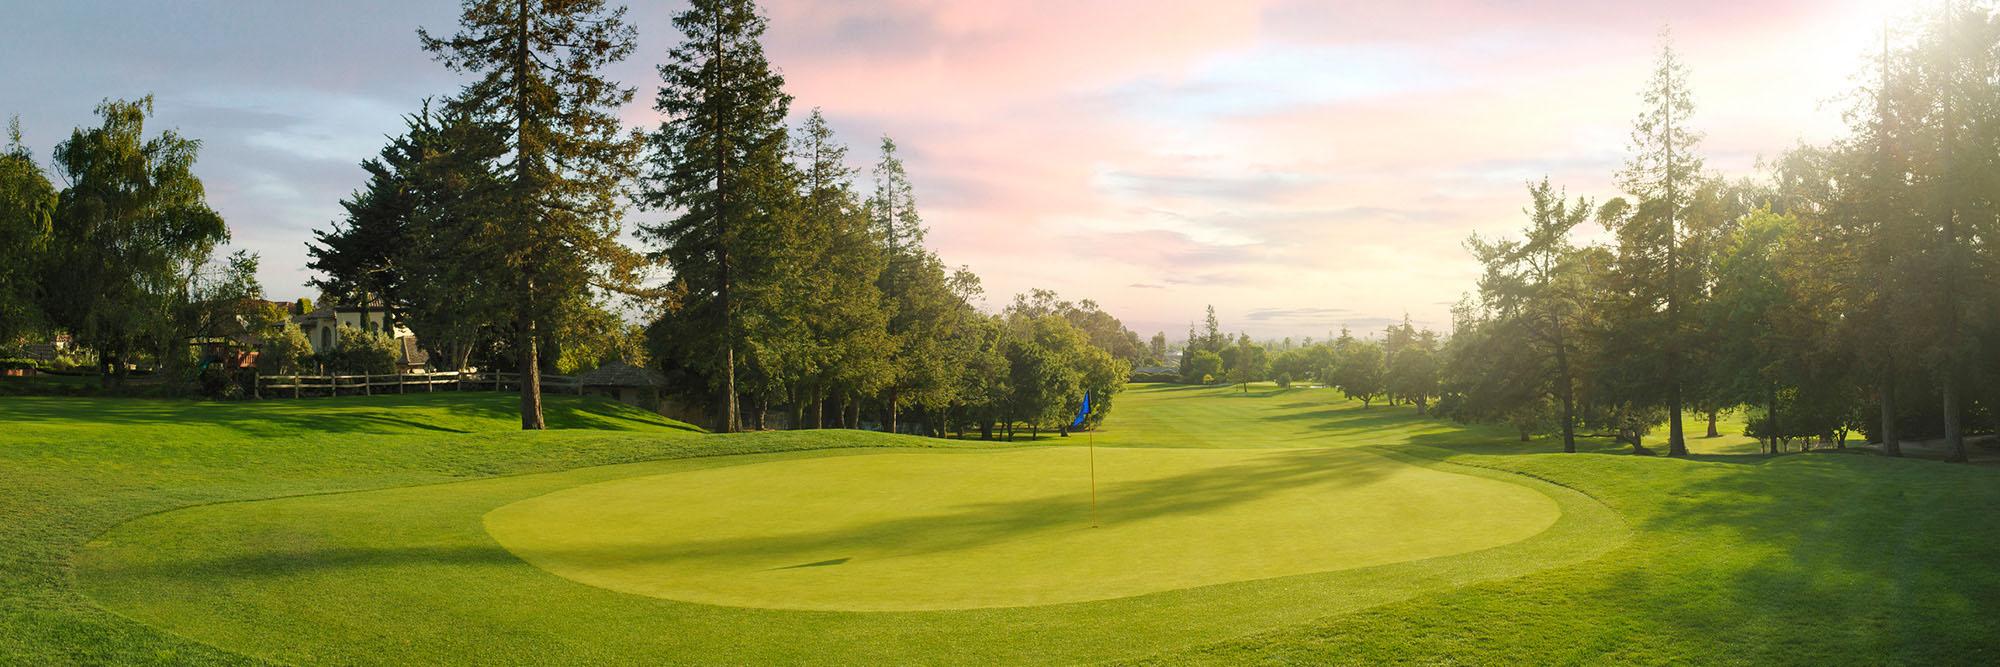 Golf Course Image - San Jose Country Club No. 15